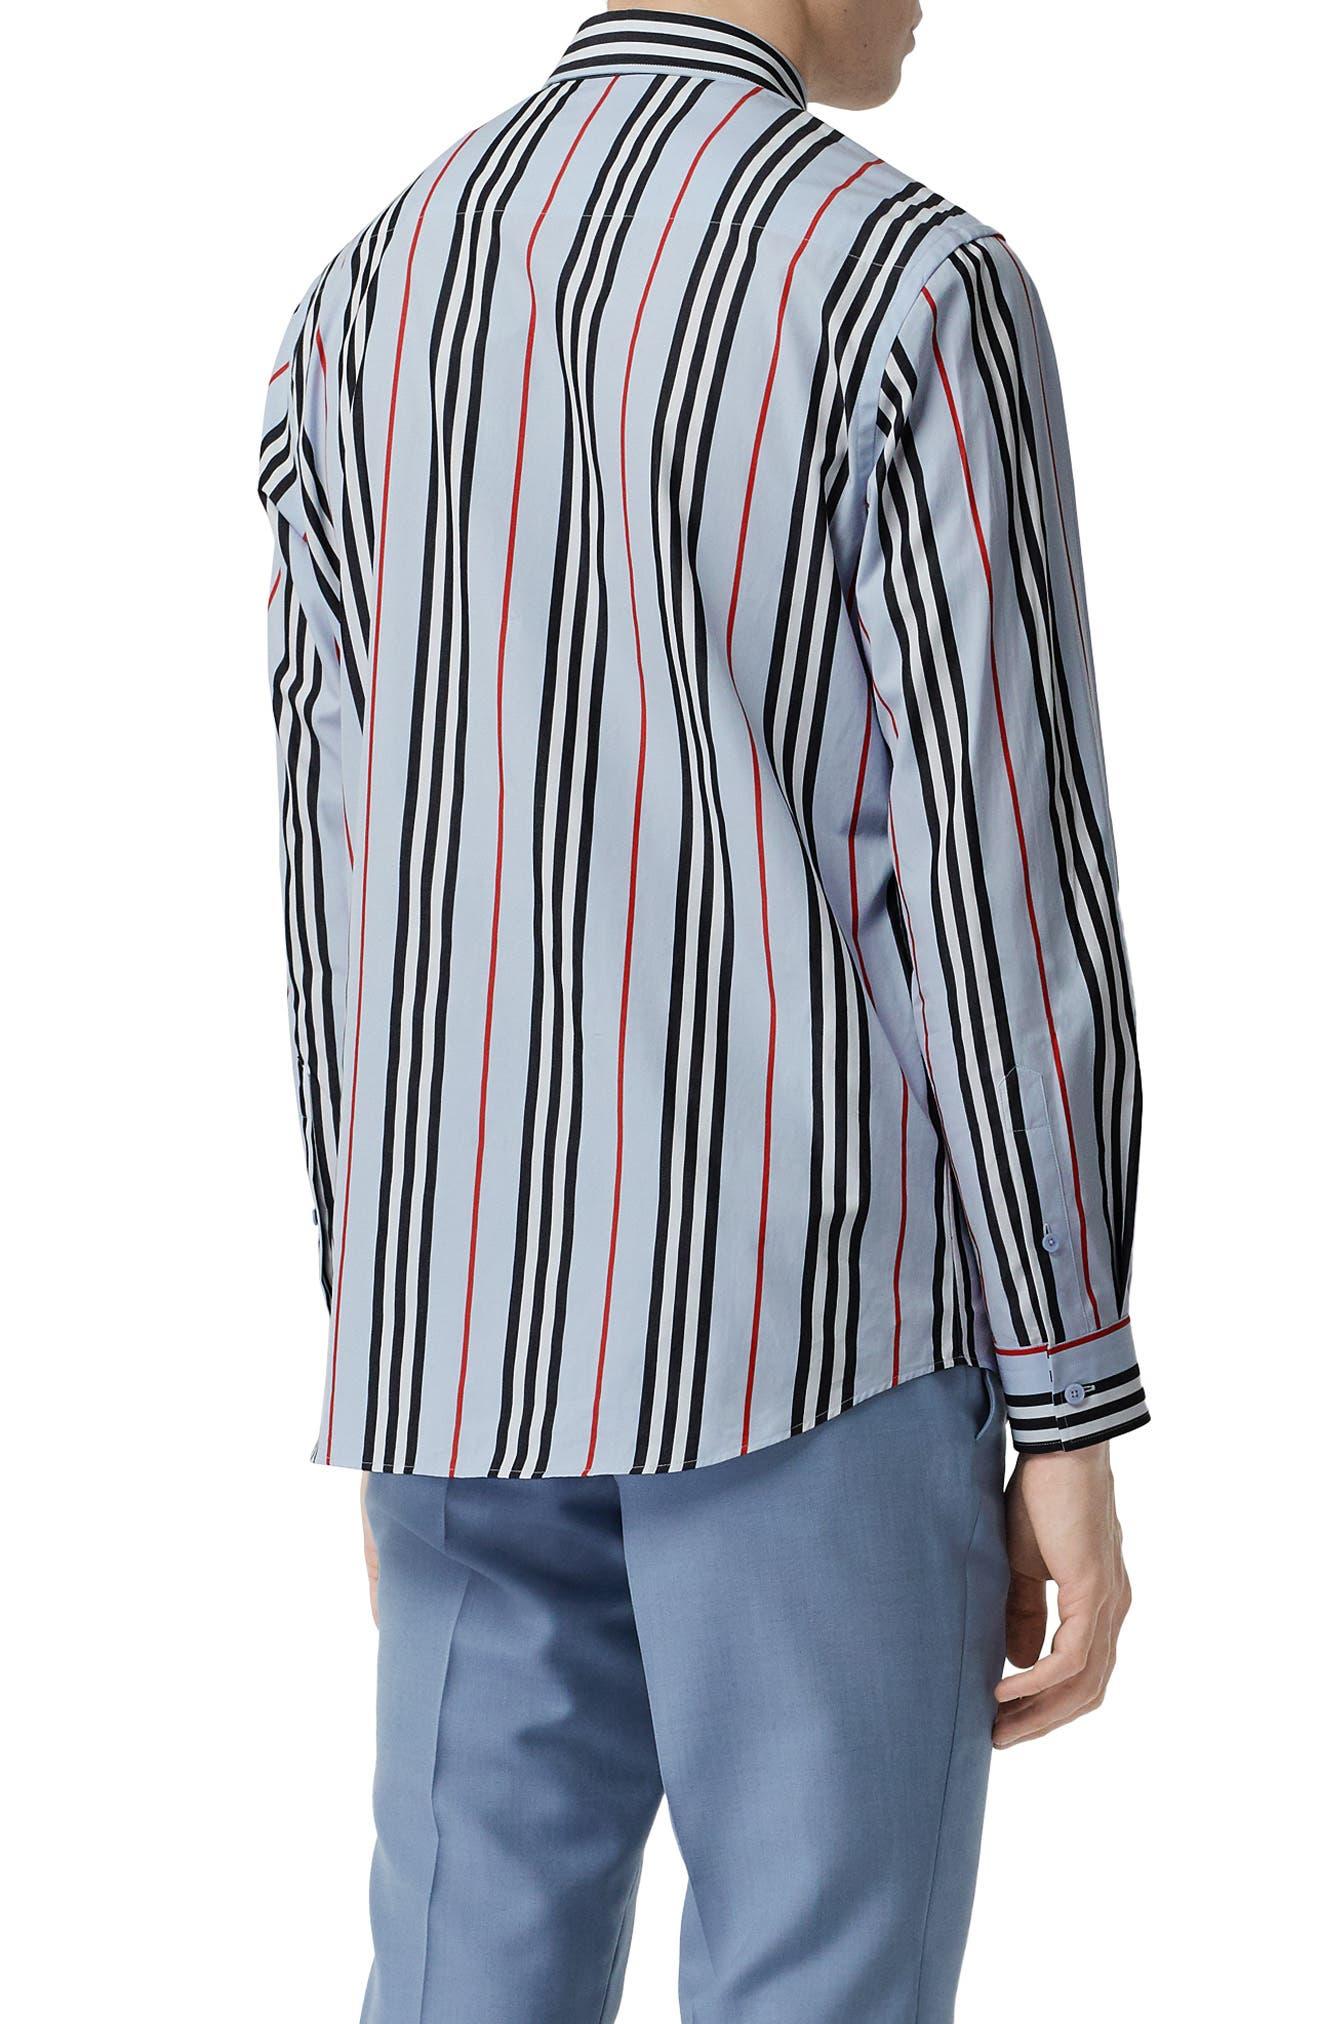 BURBERRY, Icon Stripe Shirt, Alternate thumbnail 4, color, PALE BLUE